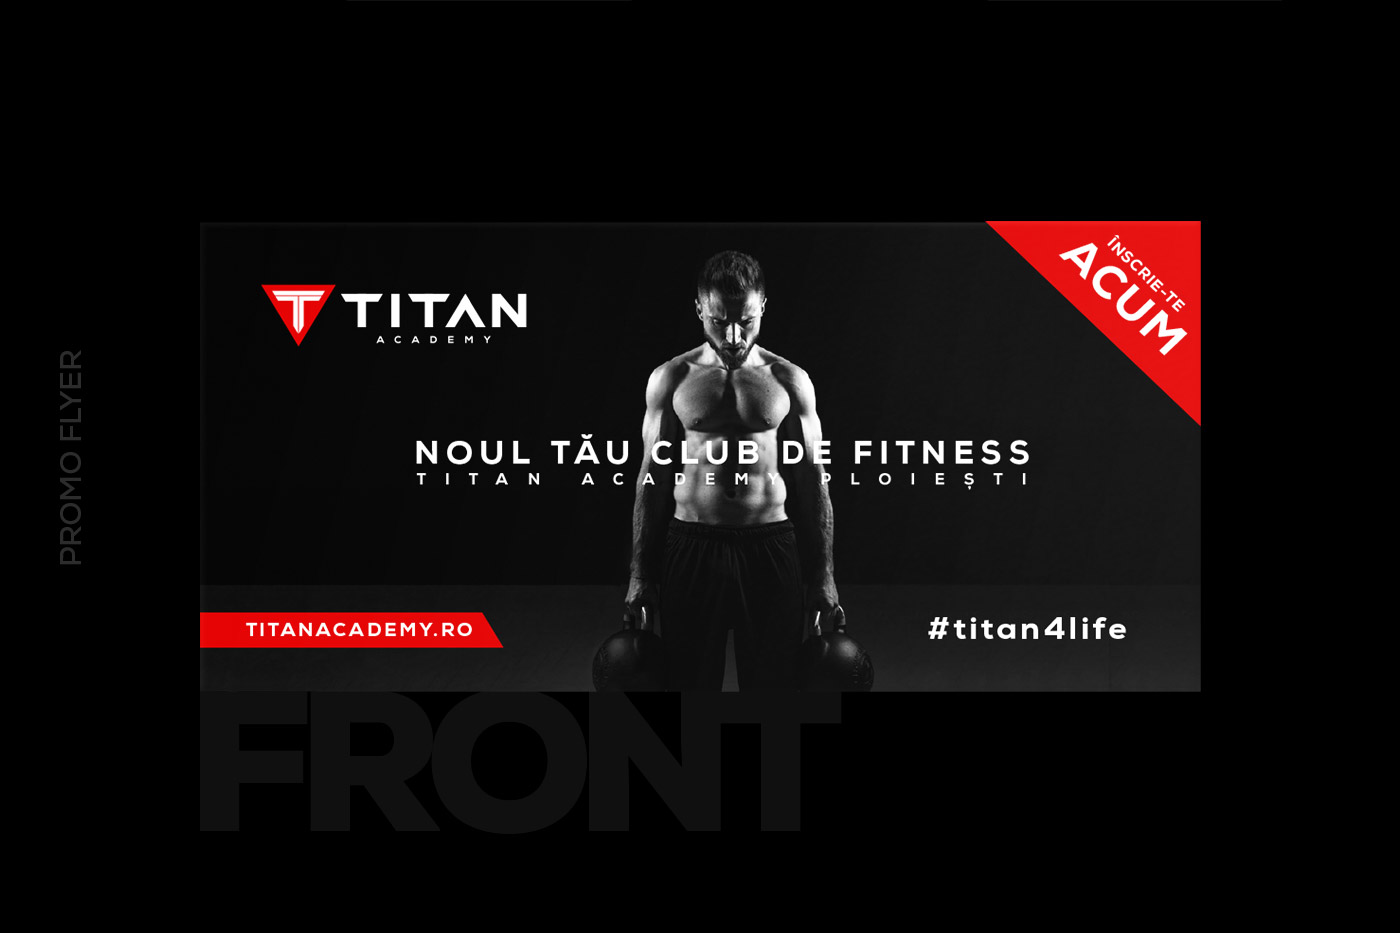 titan-academy-case-study-012.jpg